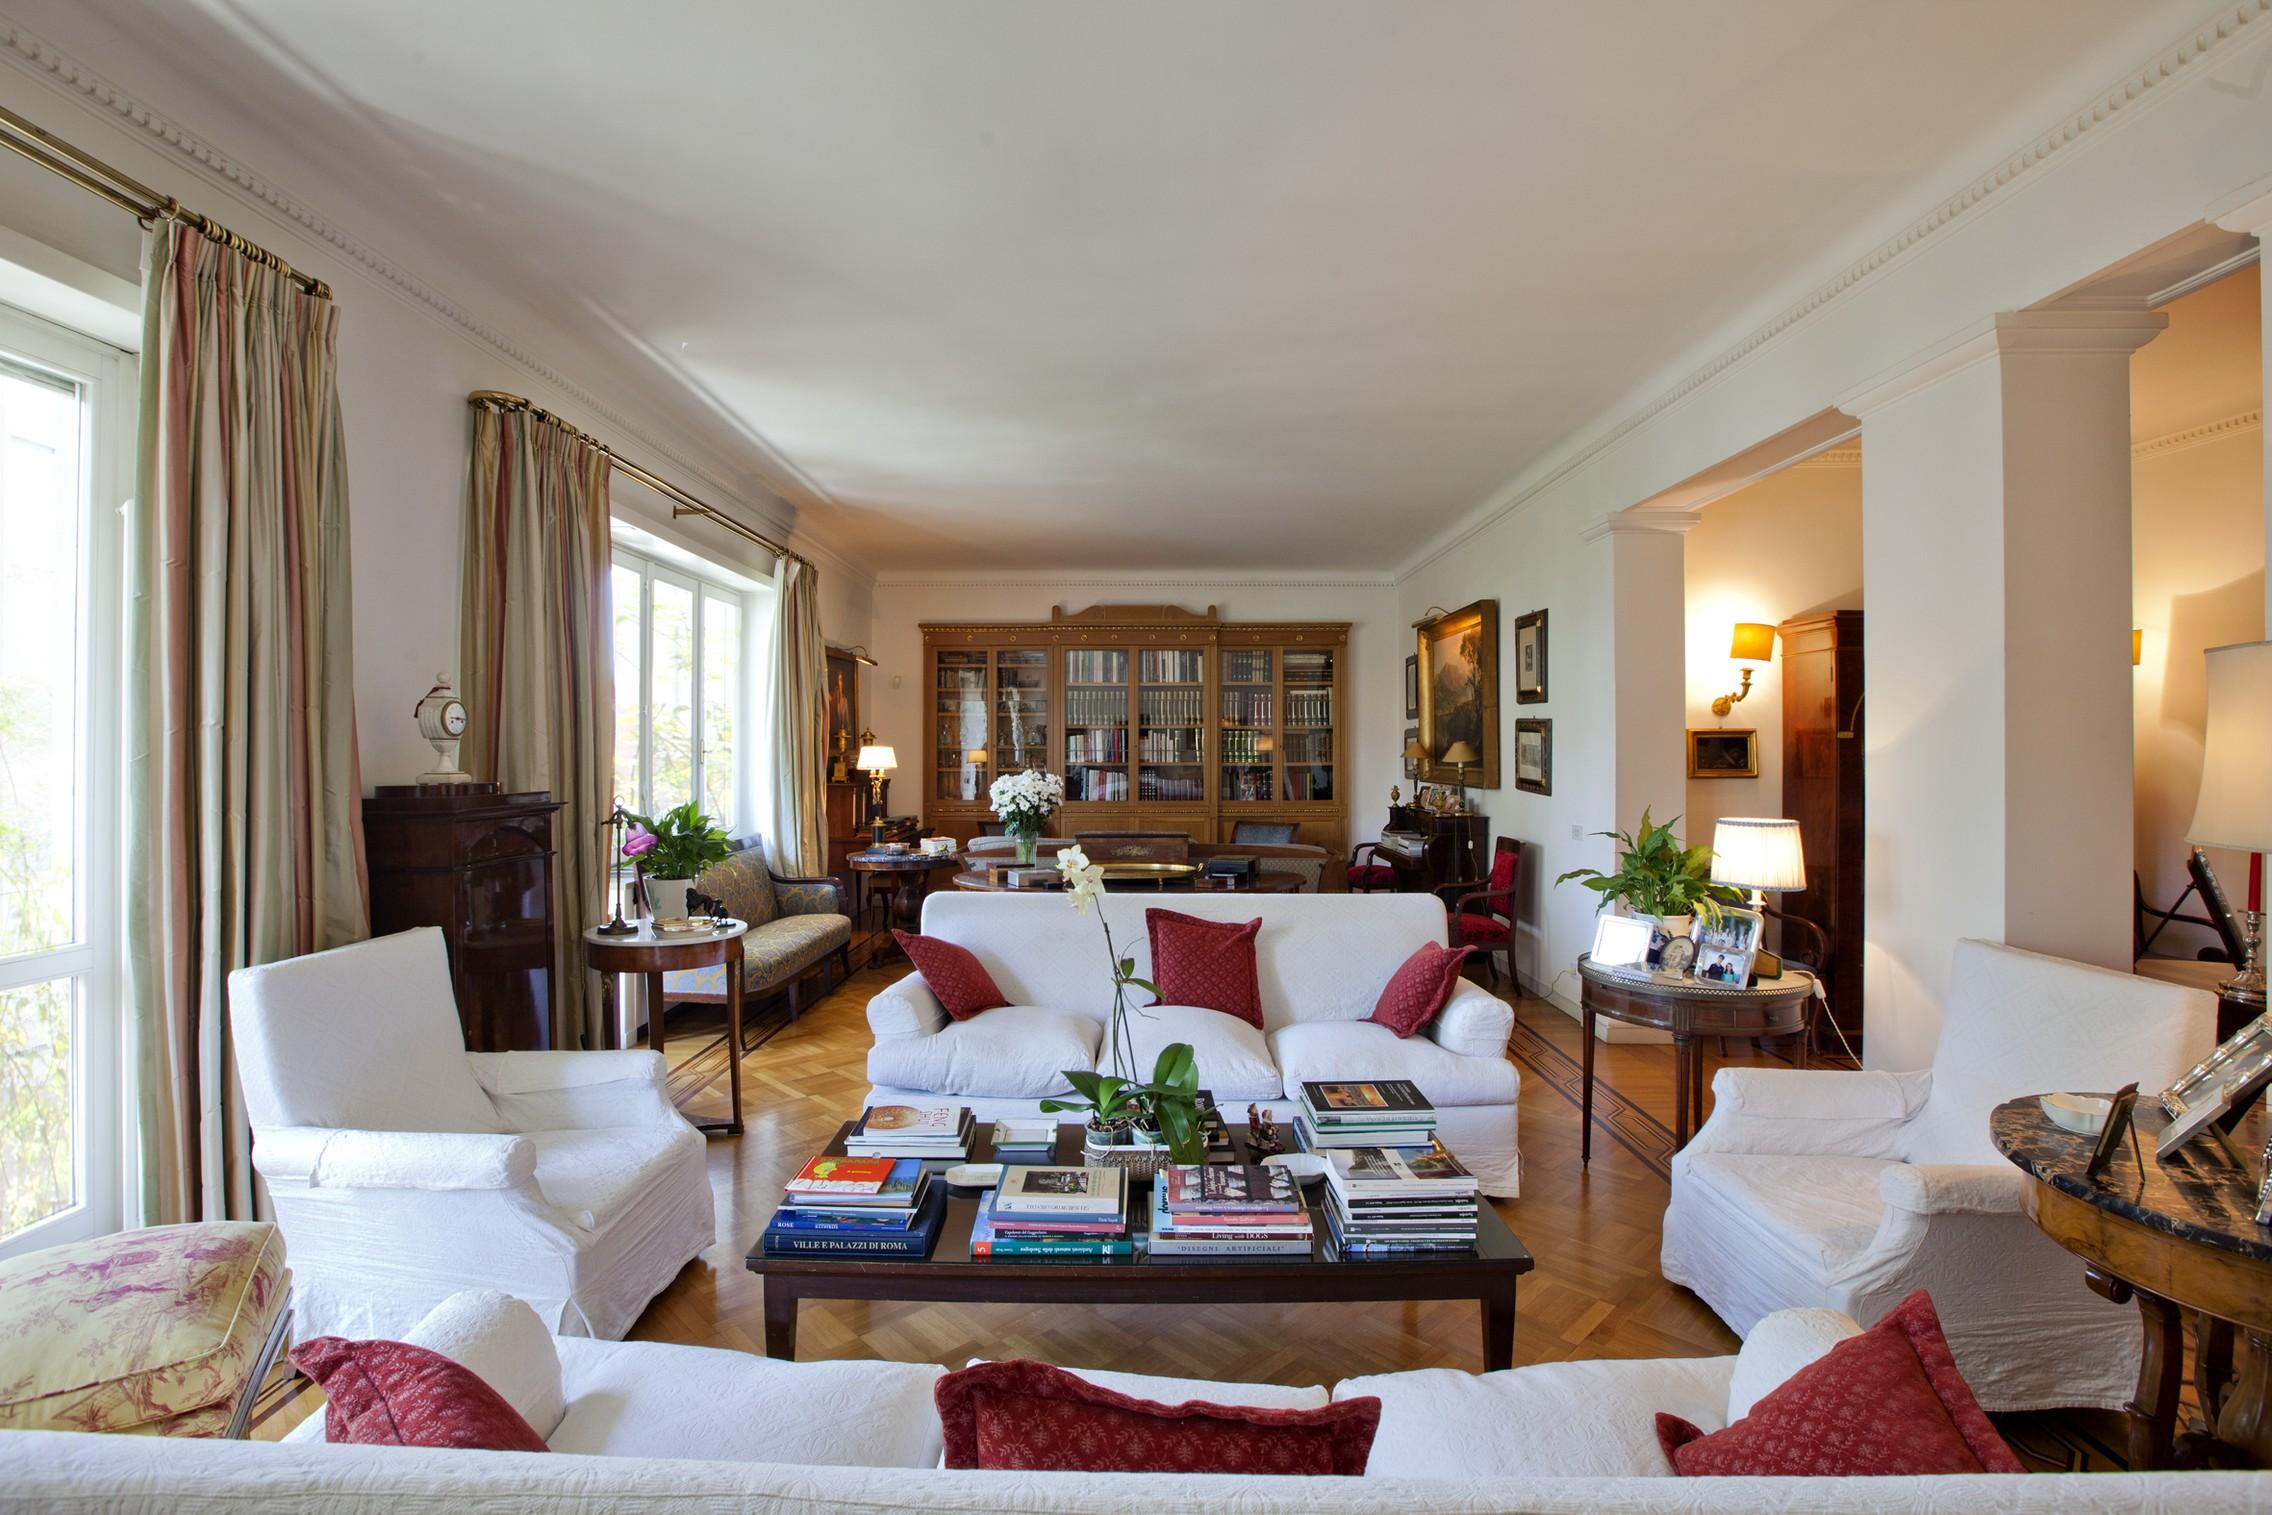 Apartamento para Venda às Splendid Rome Apartment Pietro Antonio Micheli Rome, Roma 00197 Itália